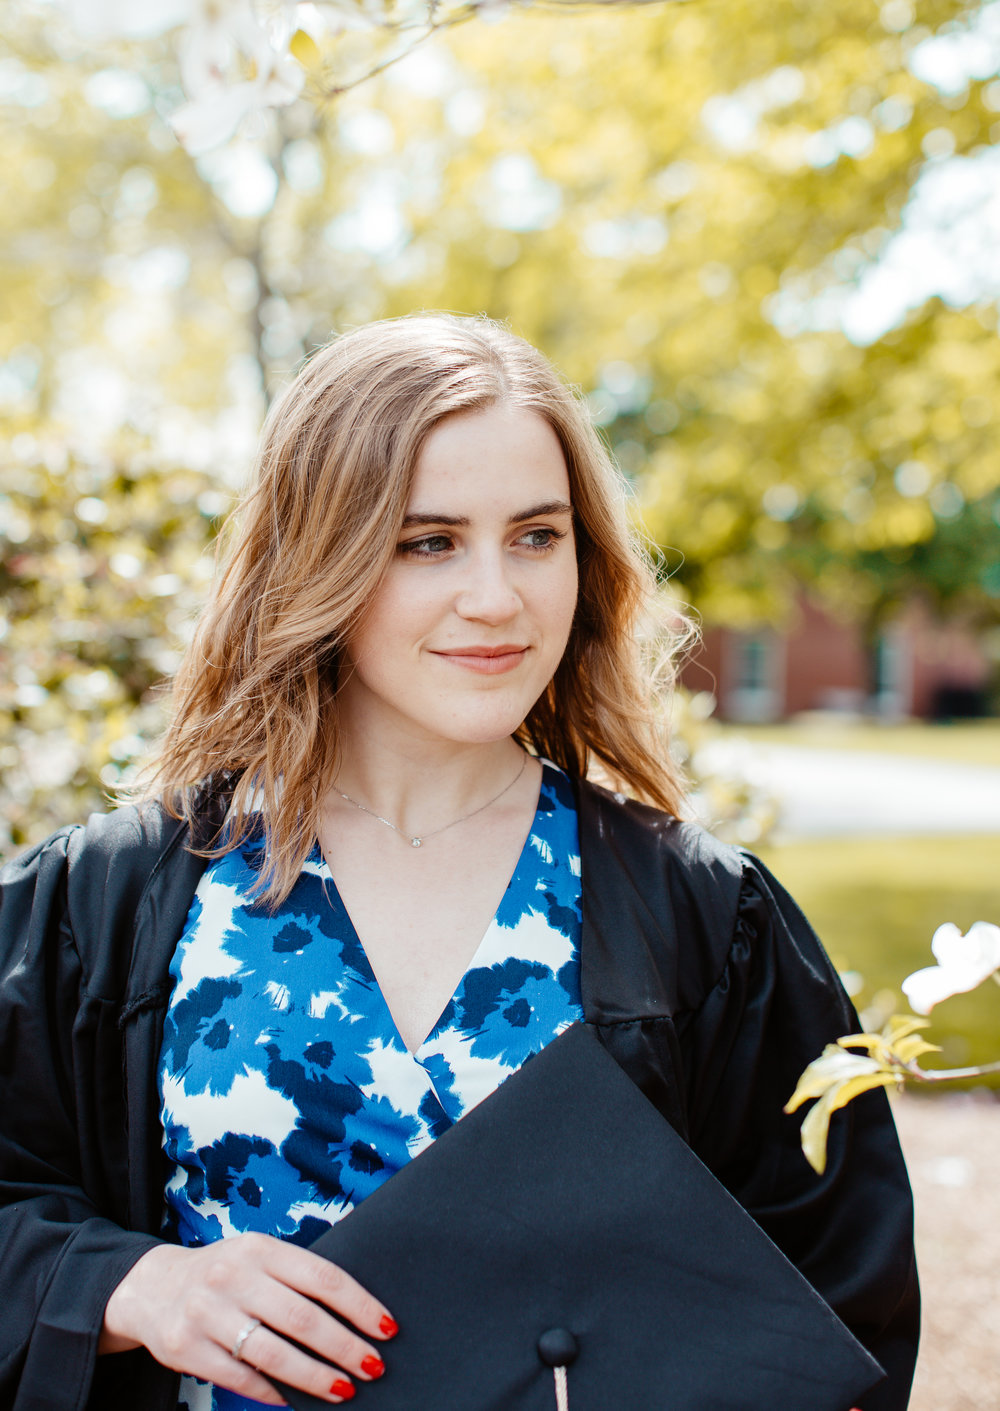 bentley-university-commencement-boston-family-photographer.jpg